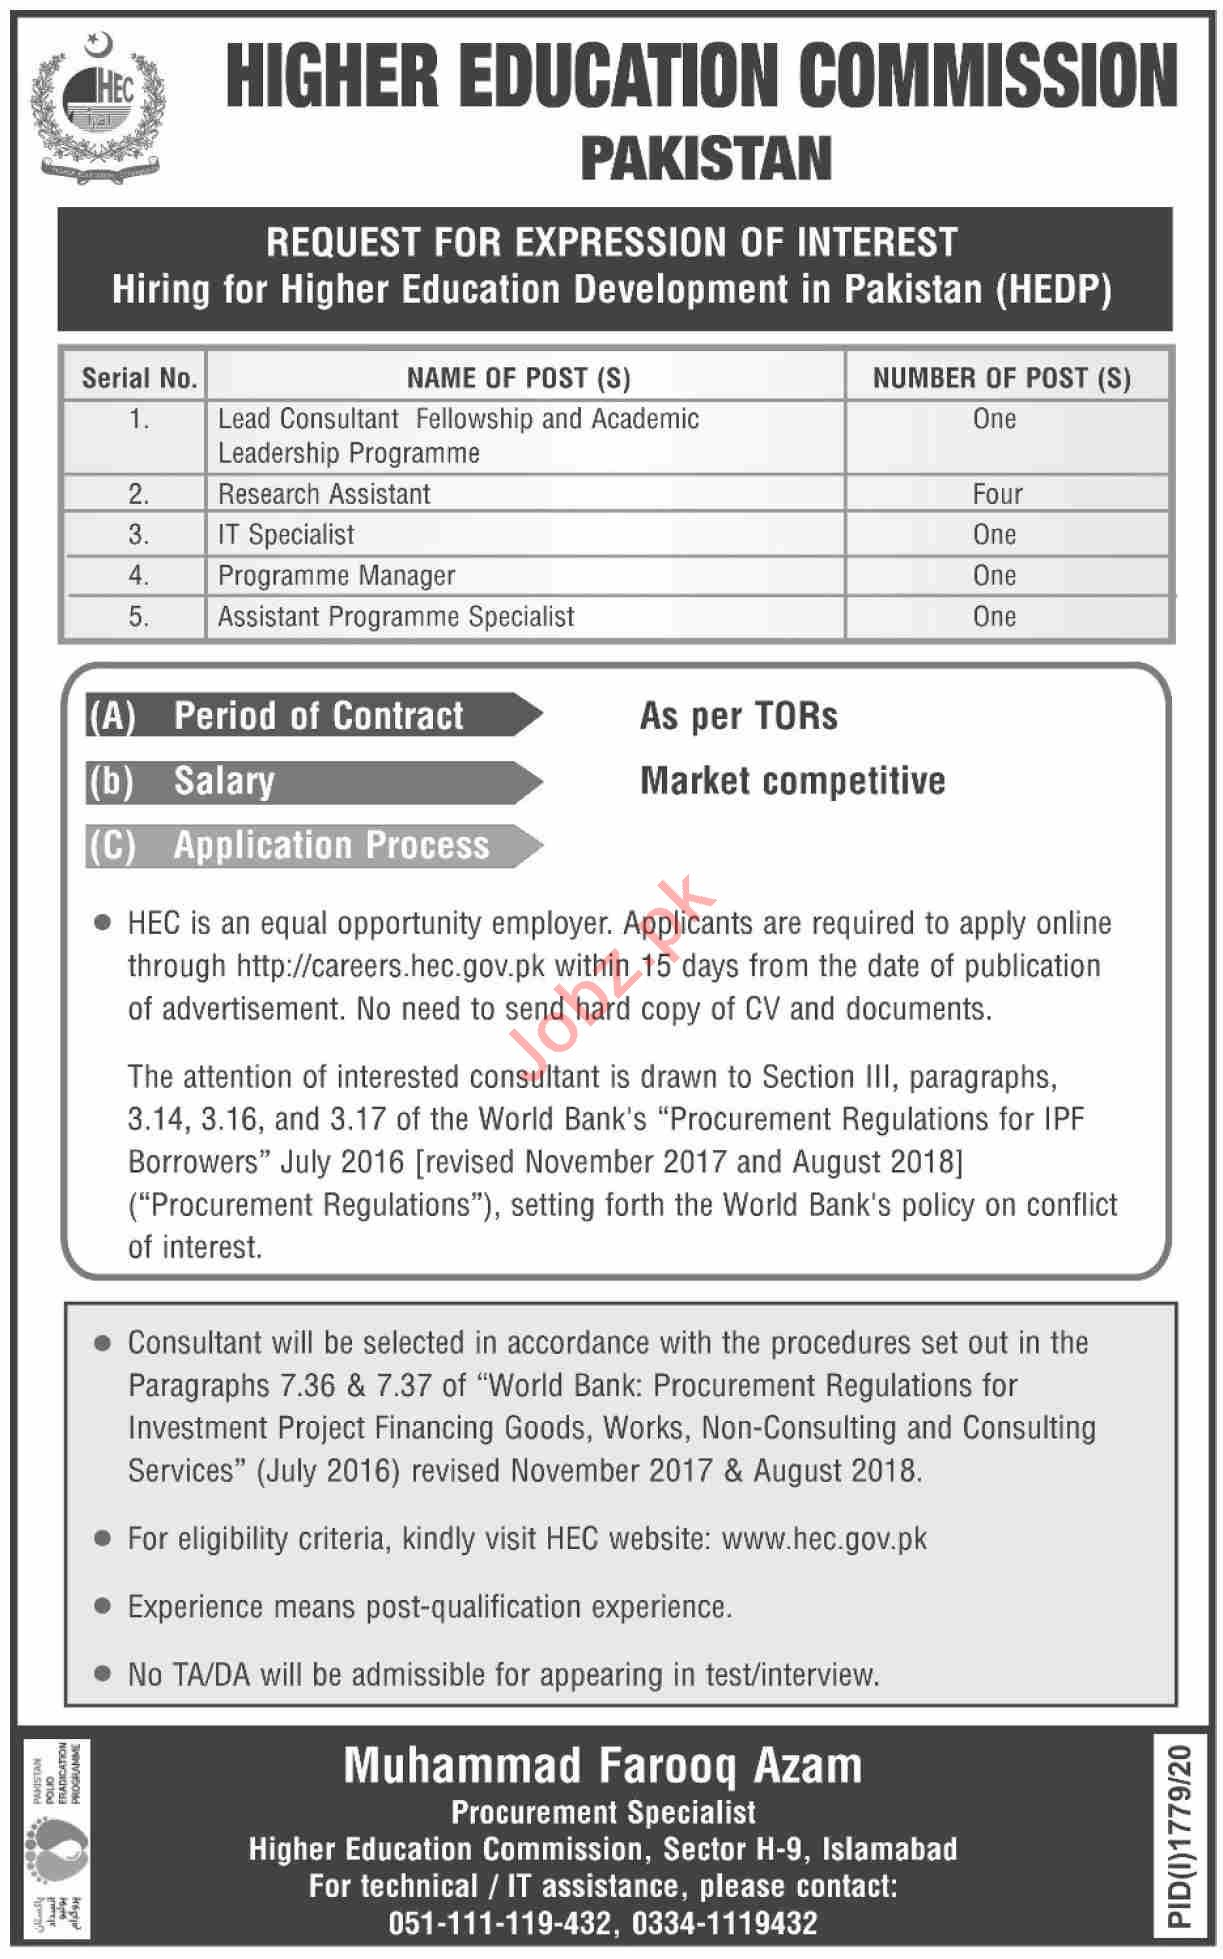 Higher Education Development in Pakistan HEDP Jobs 2020